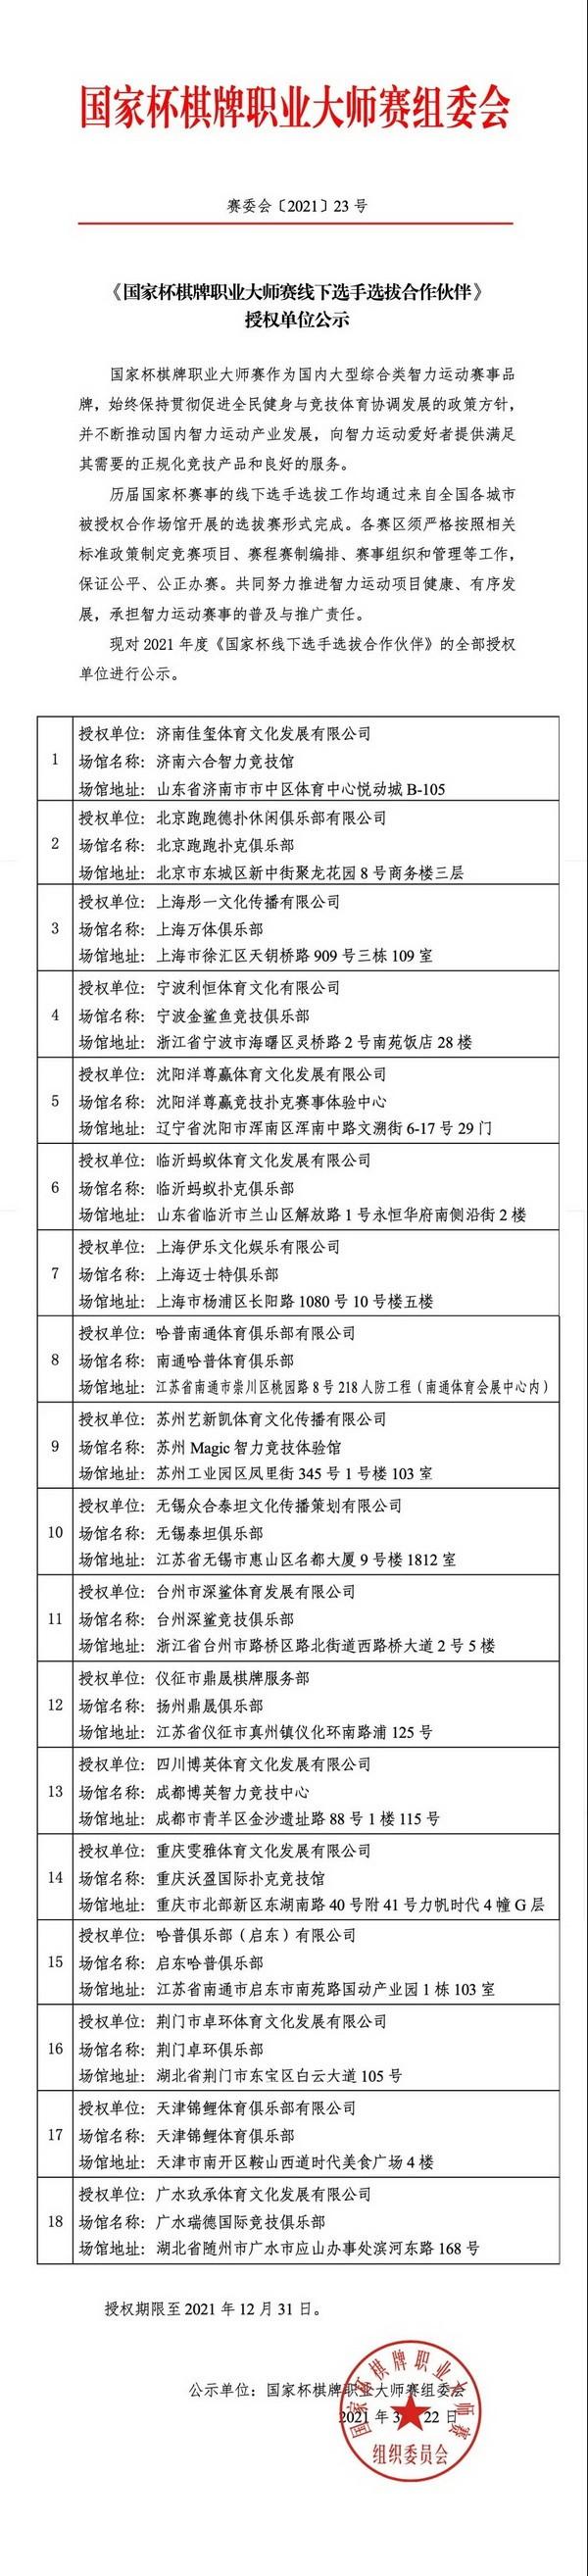 【6upoker】《国家杯棋牌职业大师赛线下选手选拔合作伙伴》授权单位公示